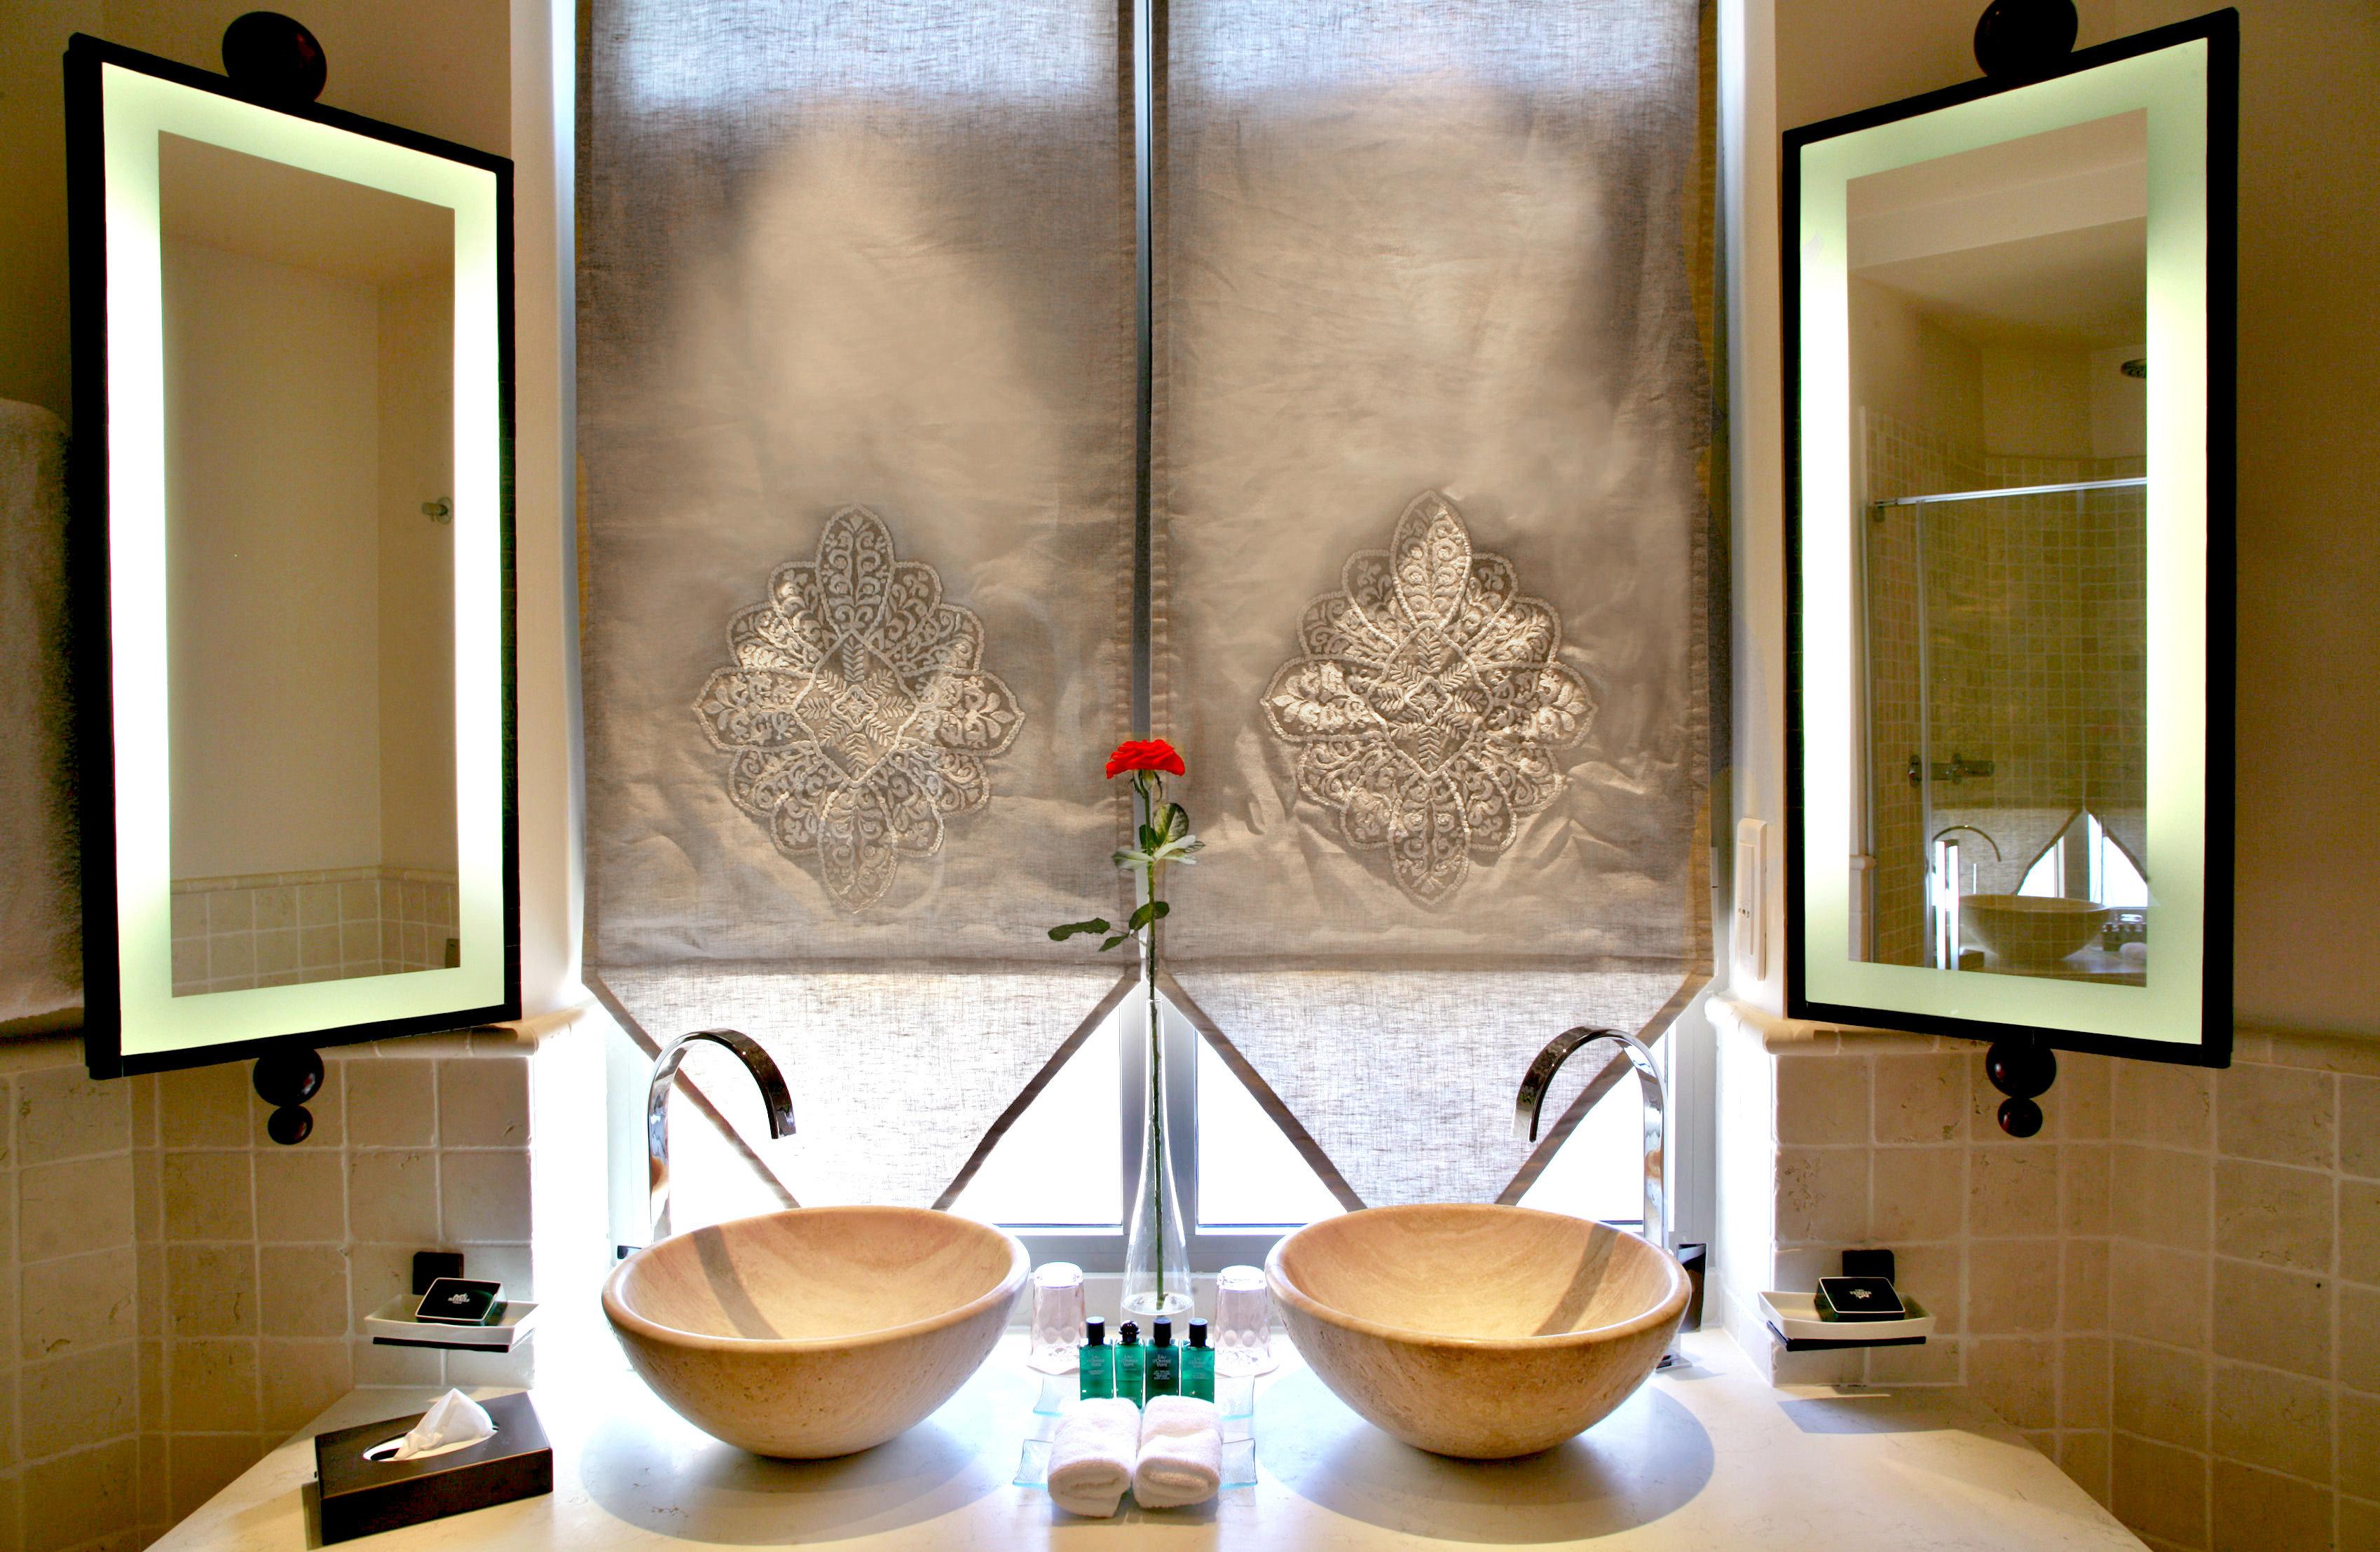 Bath Hip Luxury Modern bathroom home lighting plumbing fixture flooring tile